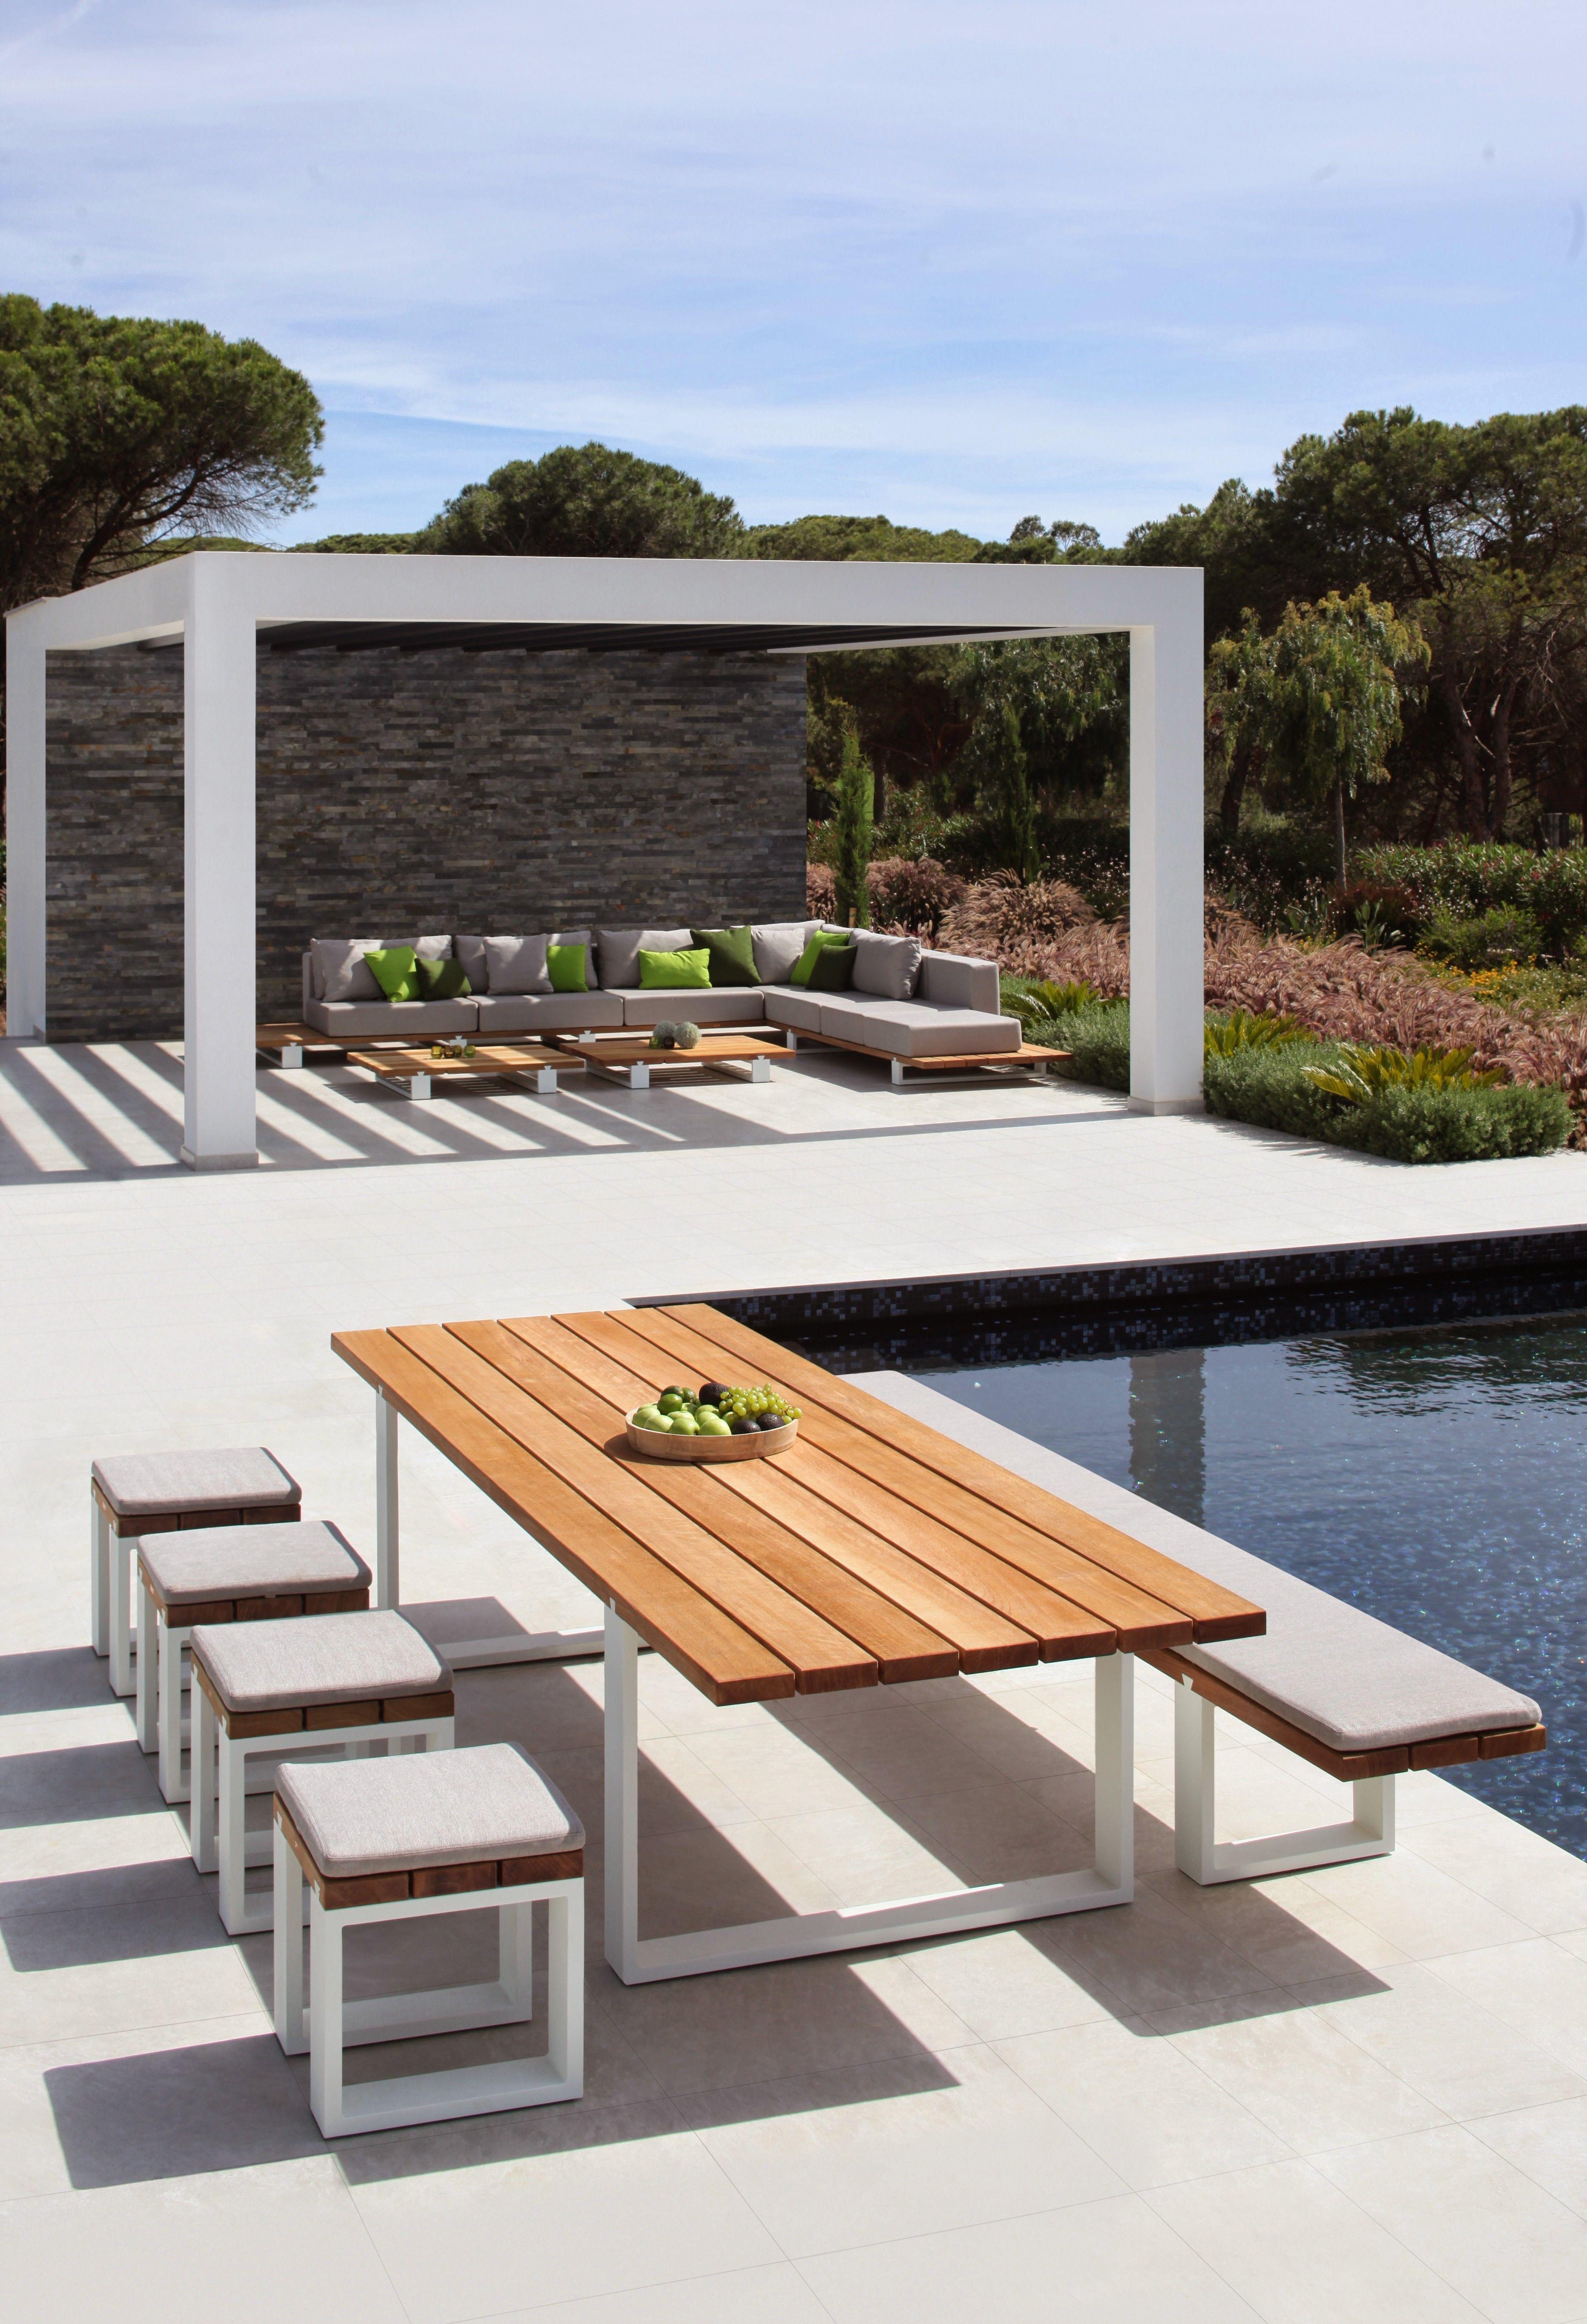 vigor designed by kris van puyvelde for royal botania belgium vigor modern garden dining